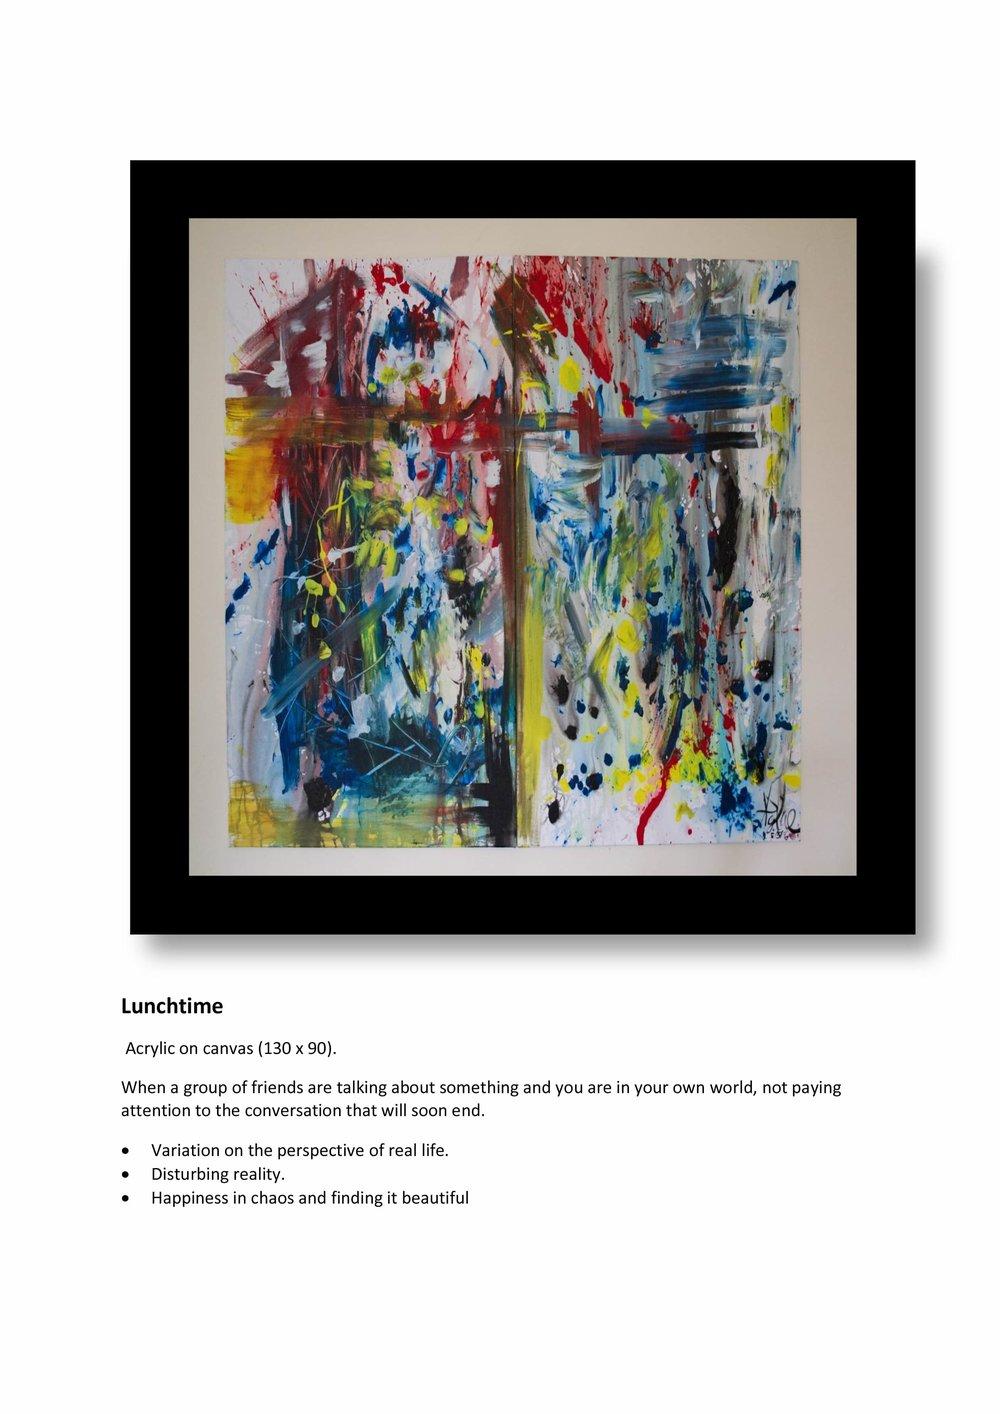 art-portfolio-aglae-corrected-2-min.jpg